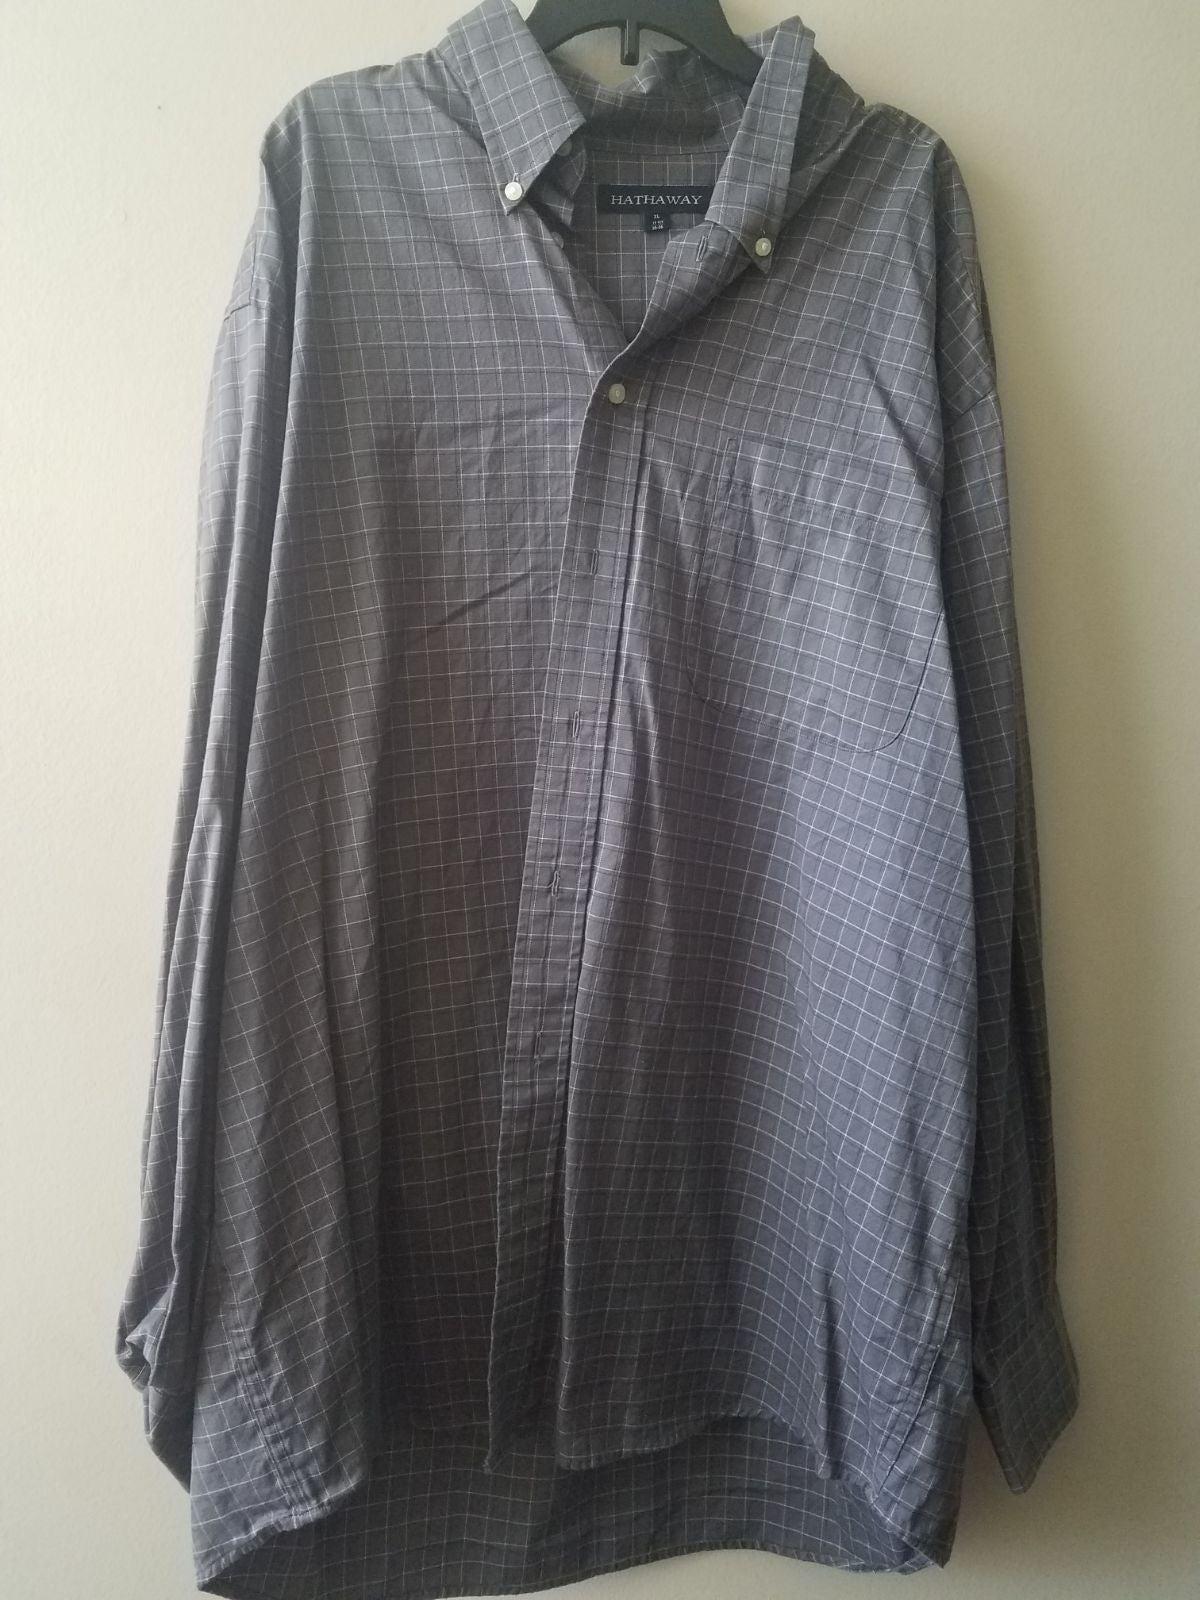 Hathaway XL dress shirt